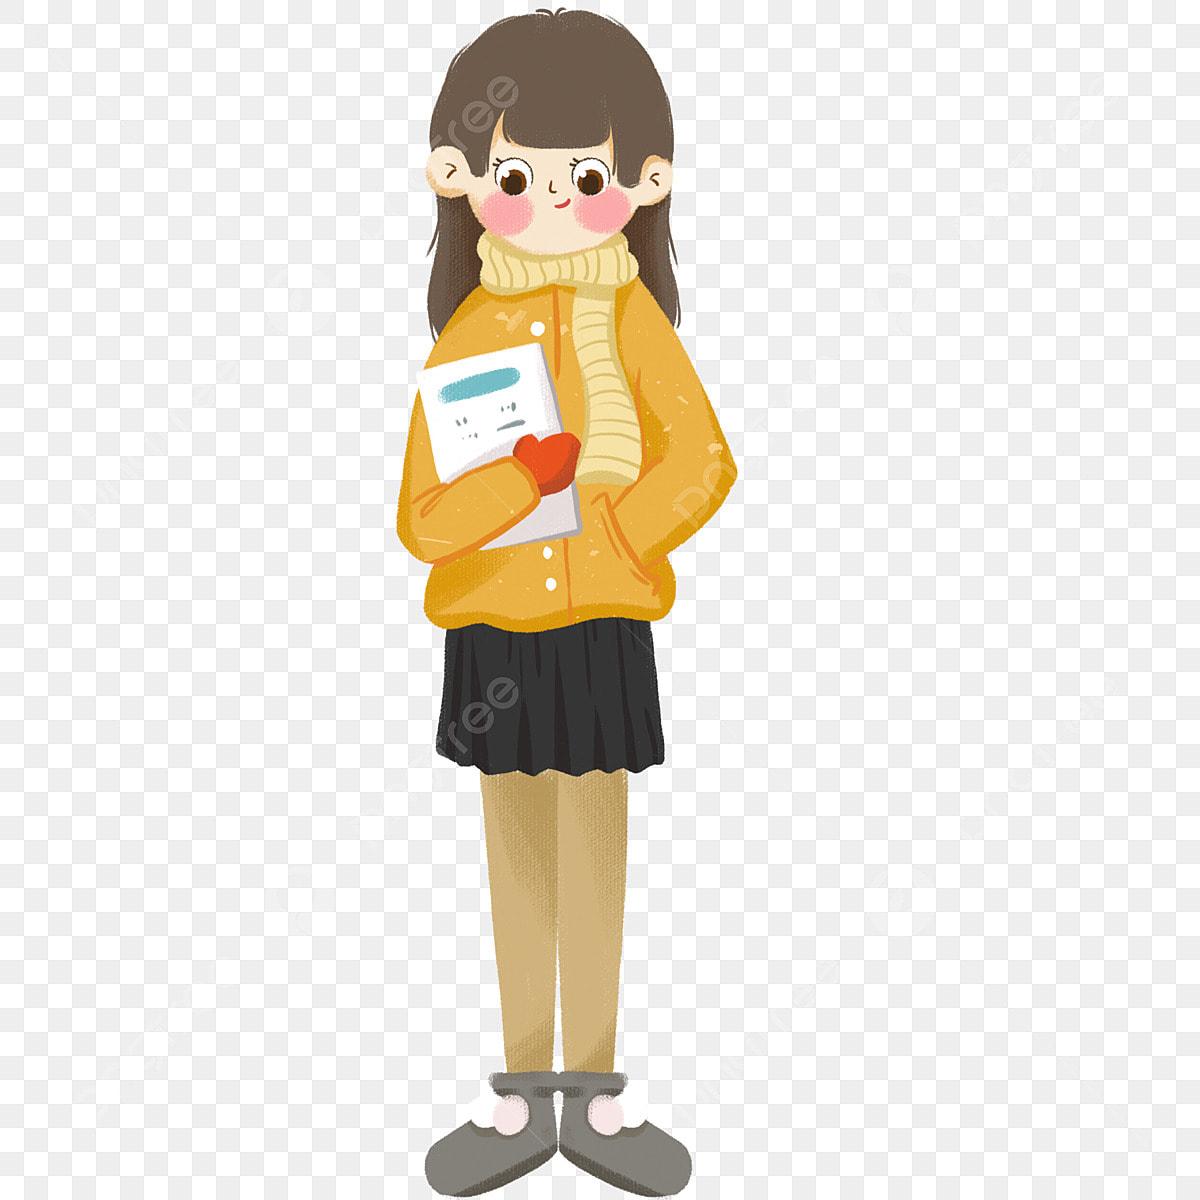 Dessinee Main Livre Anime Fille Dessin Long Une Tenant